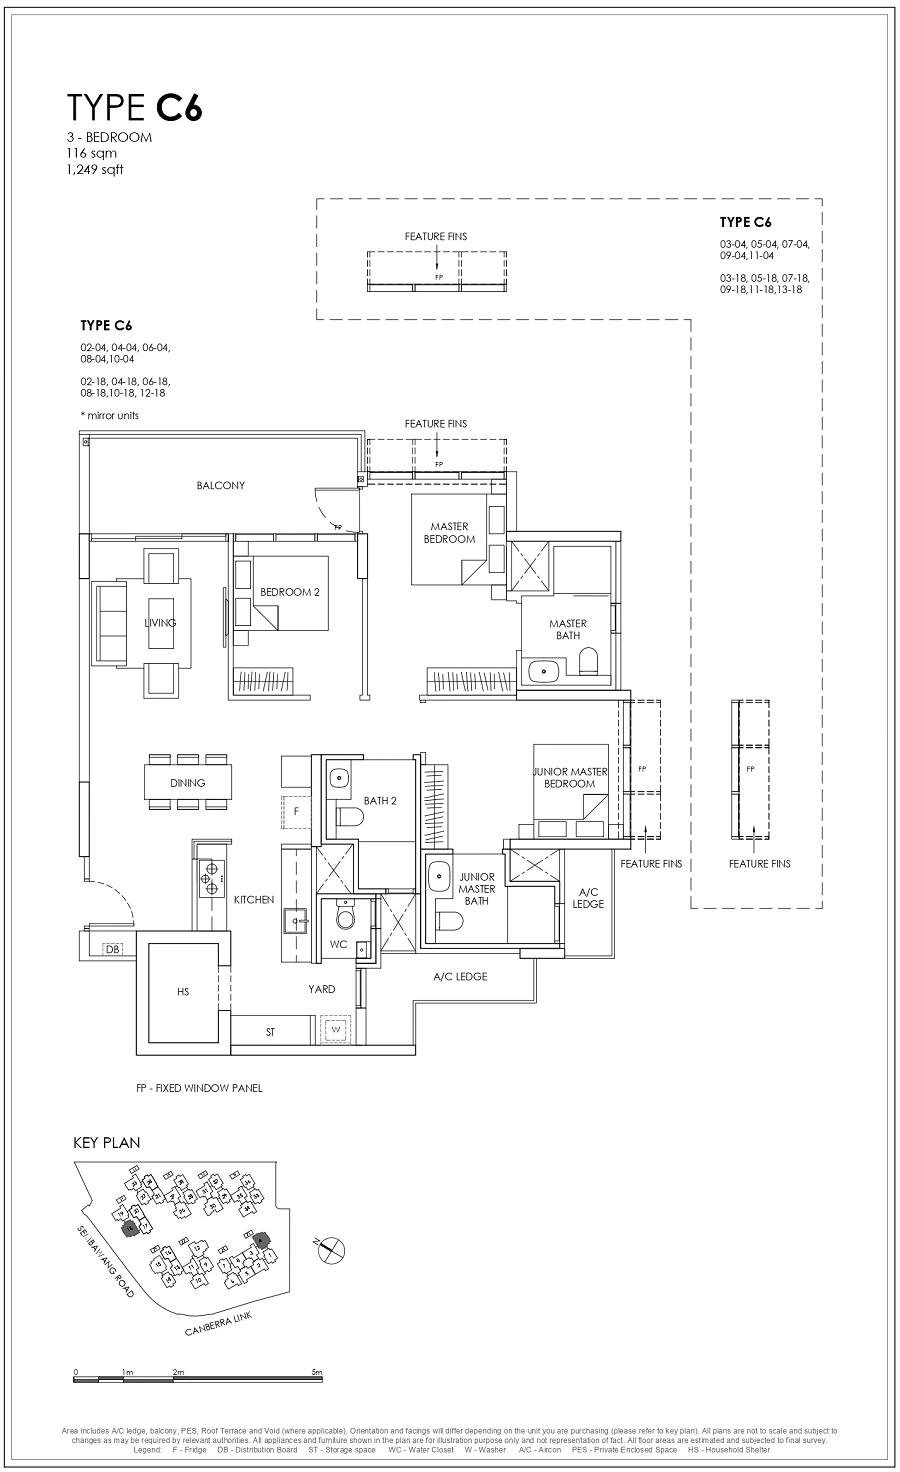 Provence Residence EC 3BR Type C6 116_1249